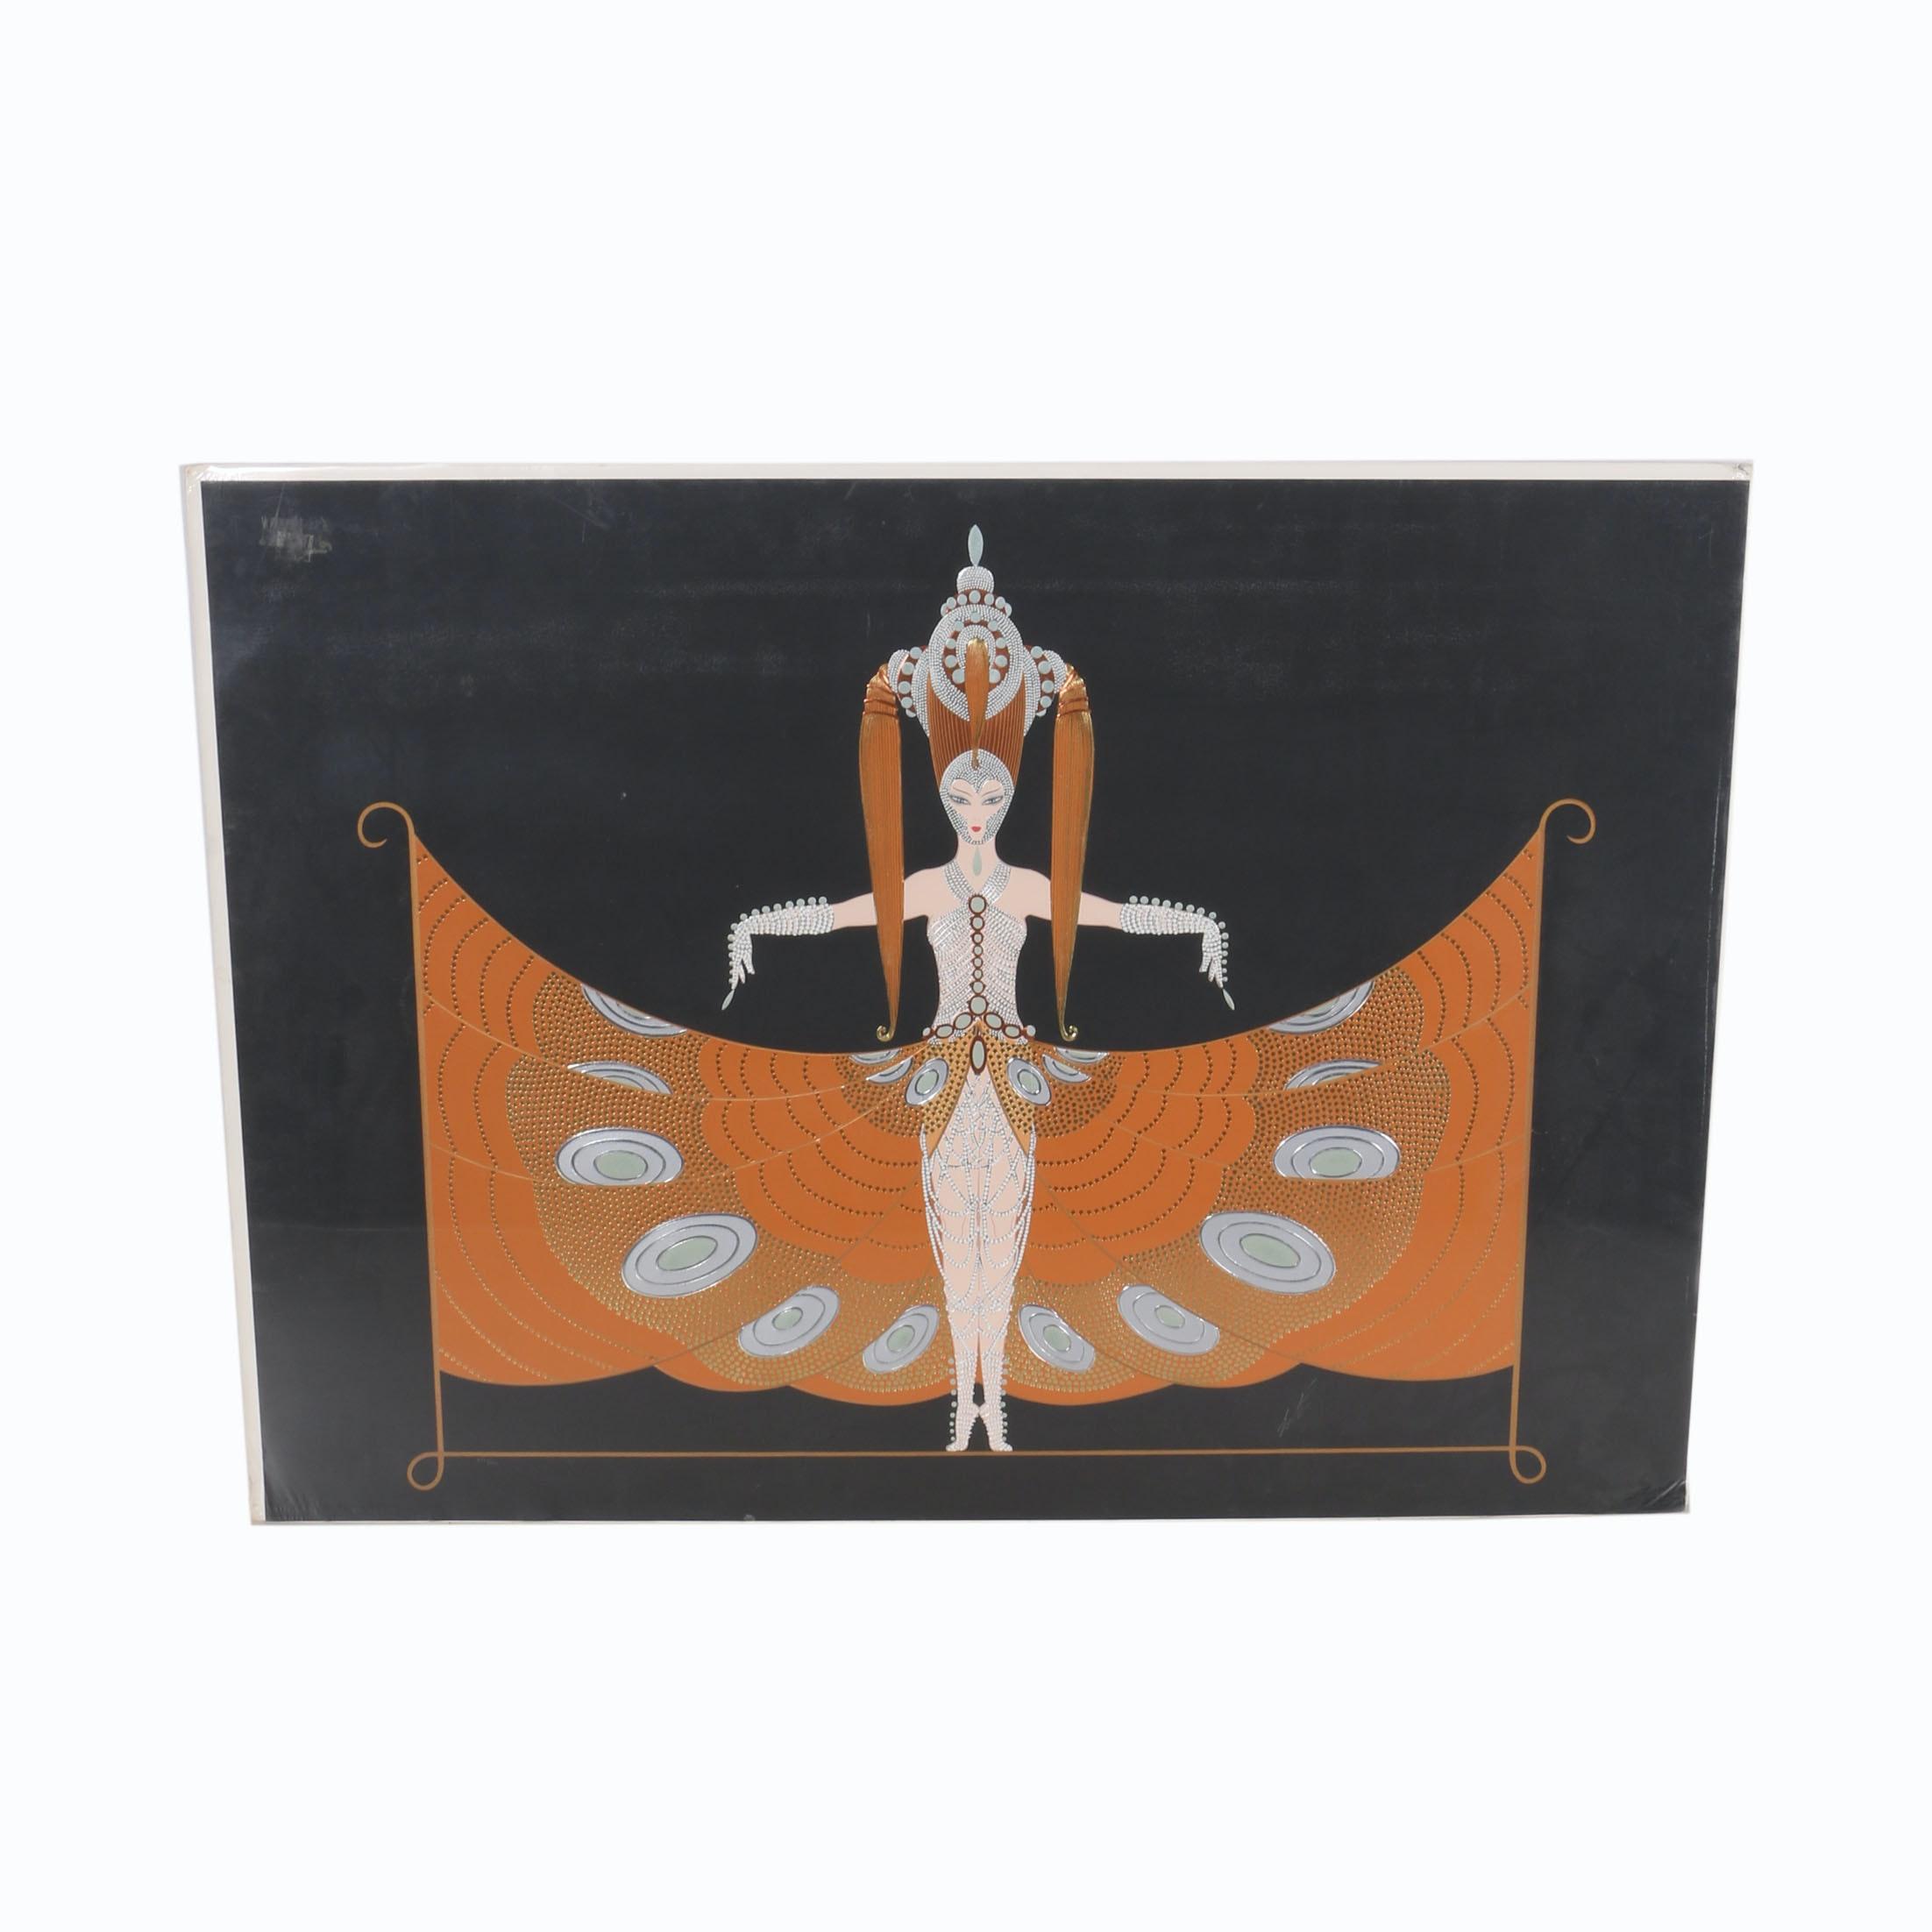 "Erté 1987 Limited Edition Serigraph ""Hindu Princess"""